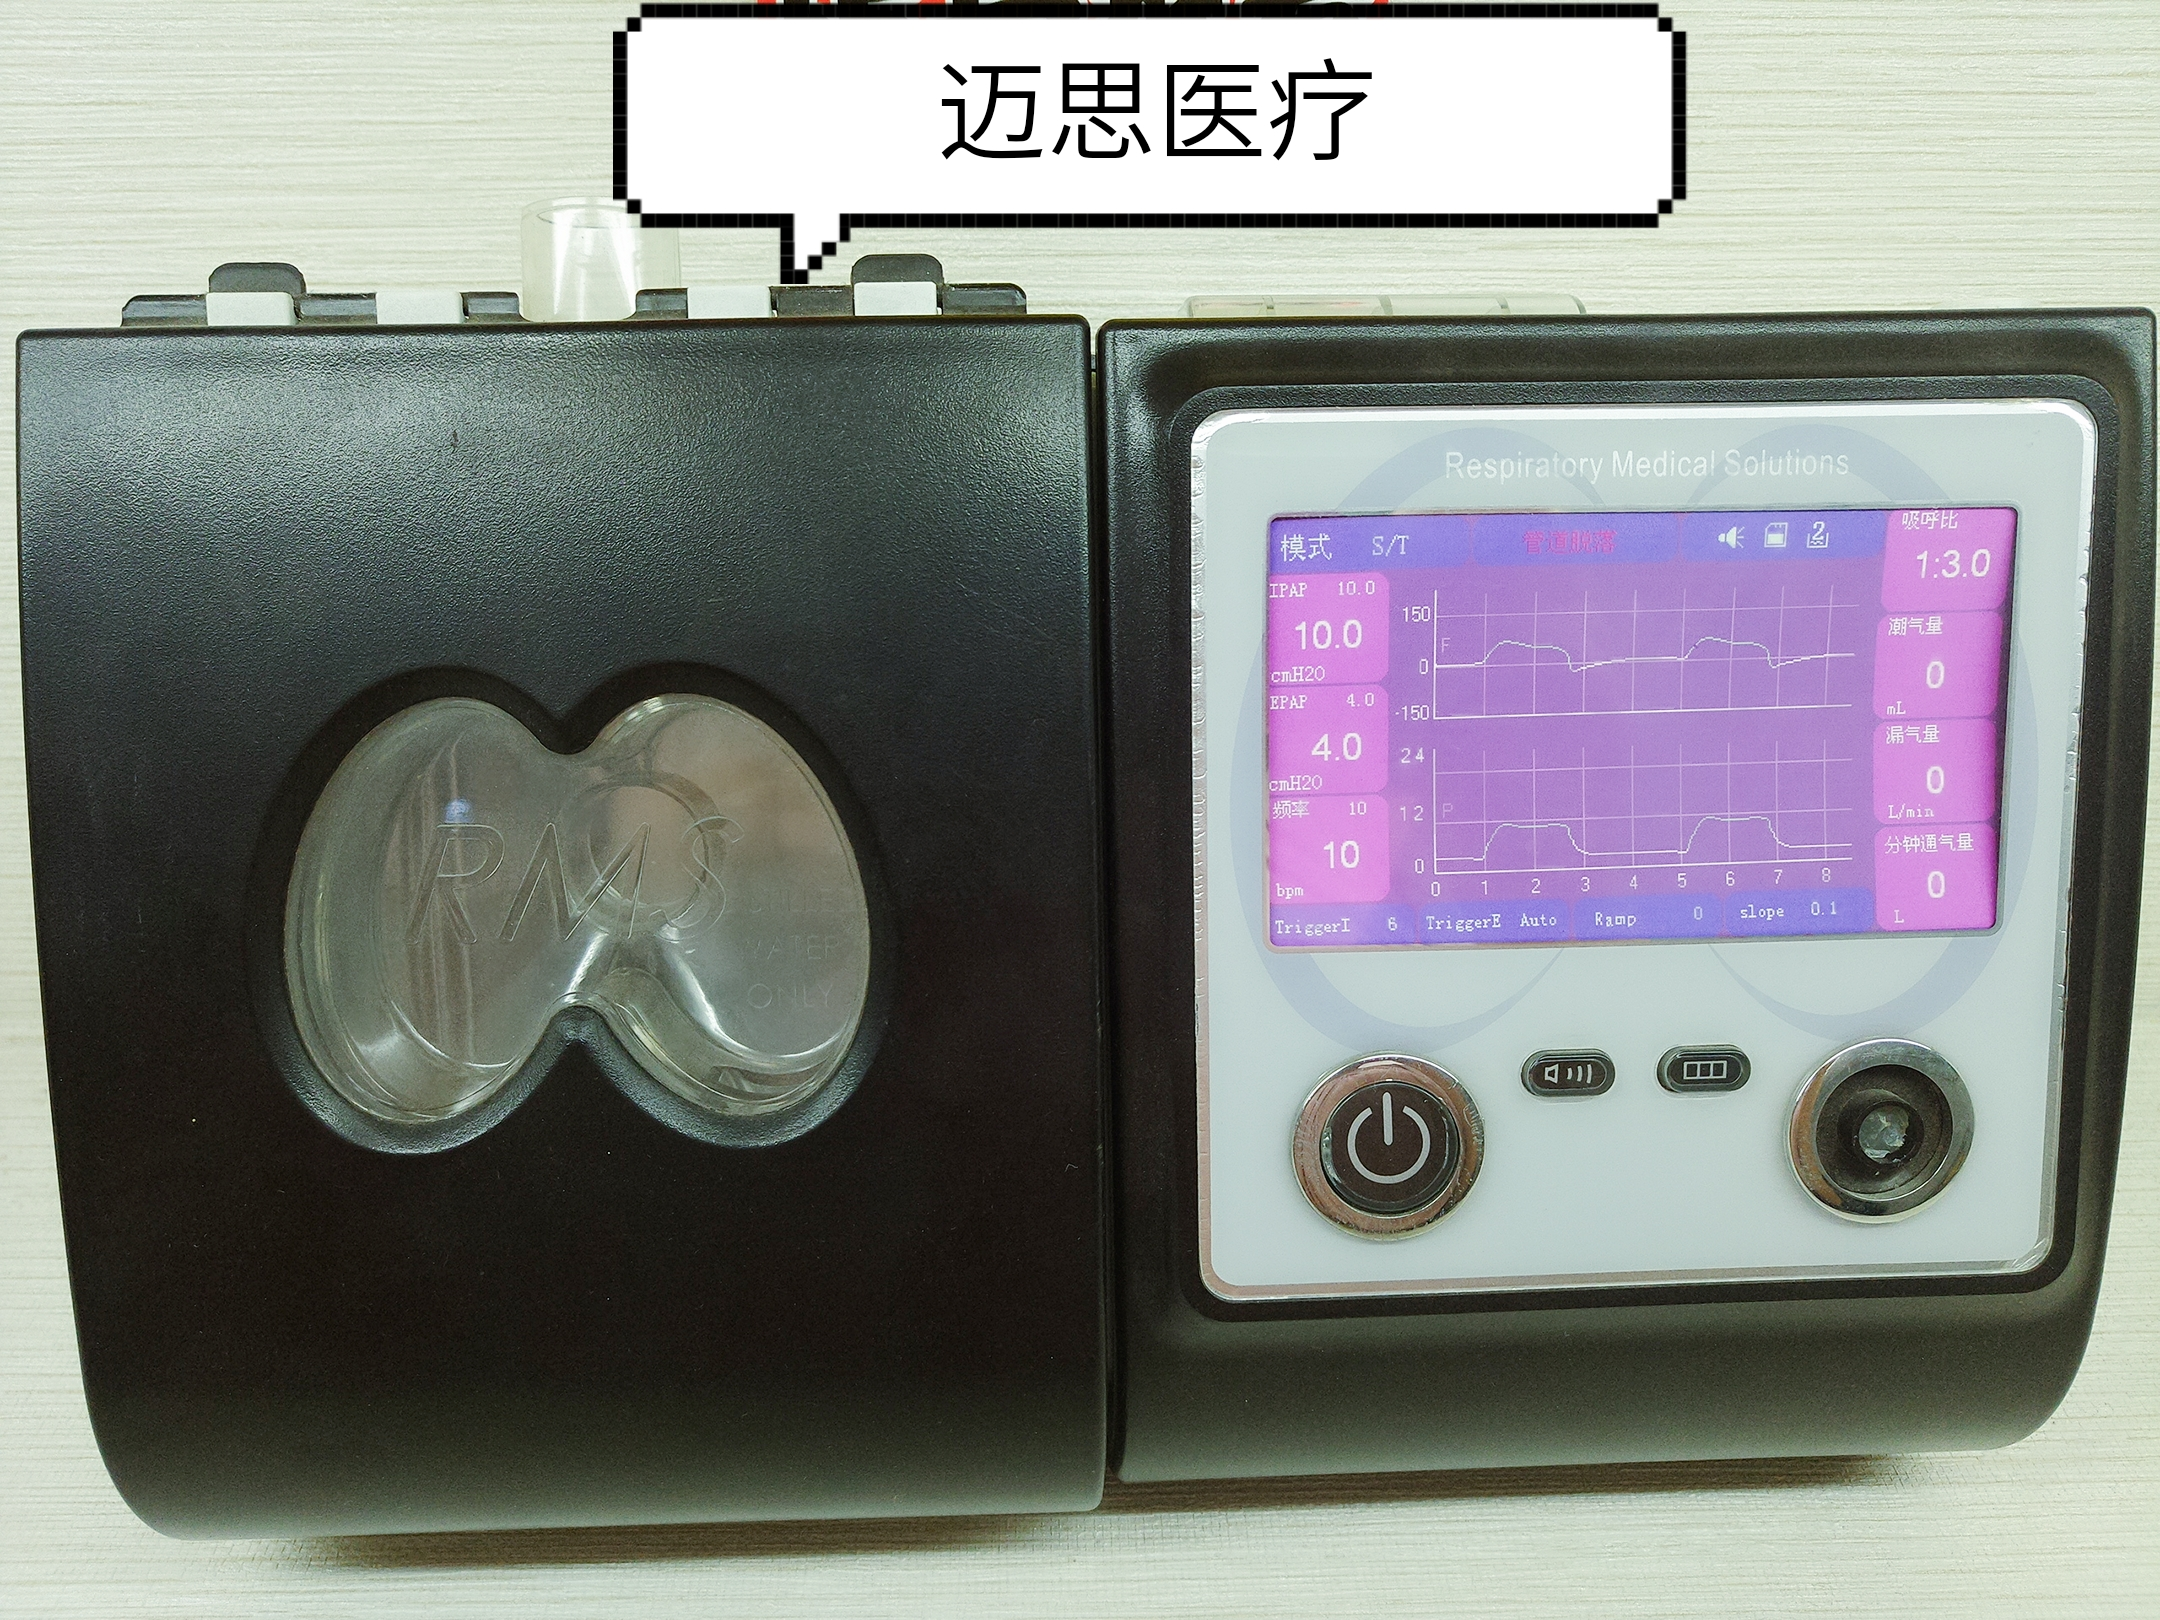 新乡呼吸机